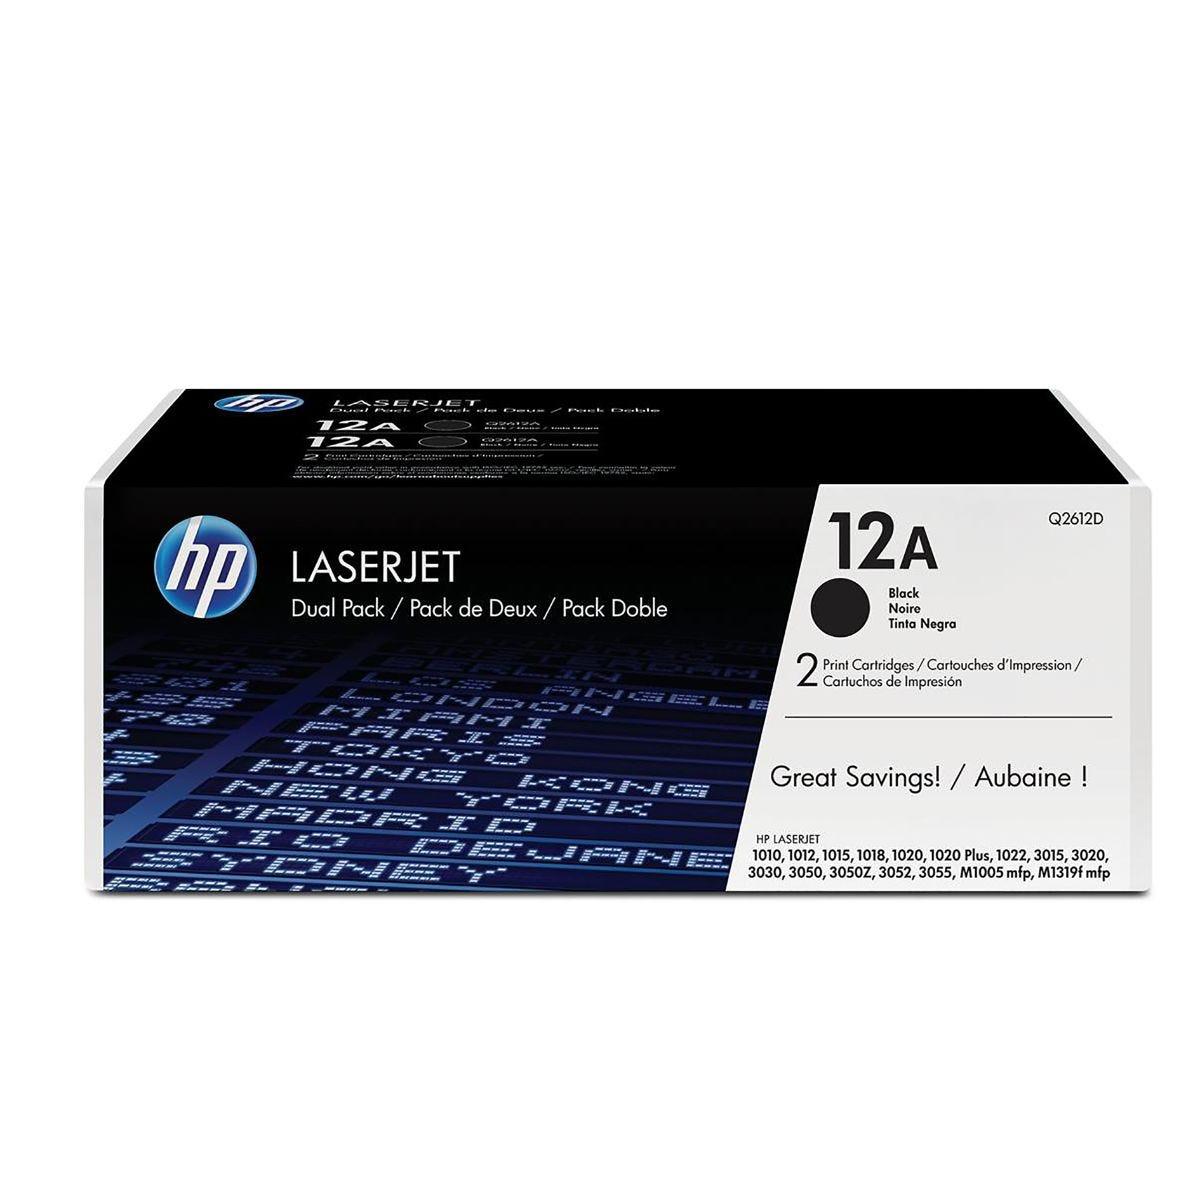 Image of HP 12A Dual Pack Toners Black, Black